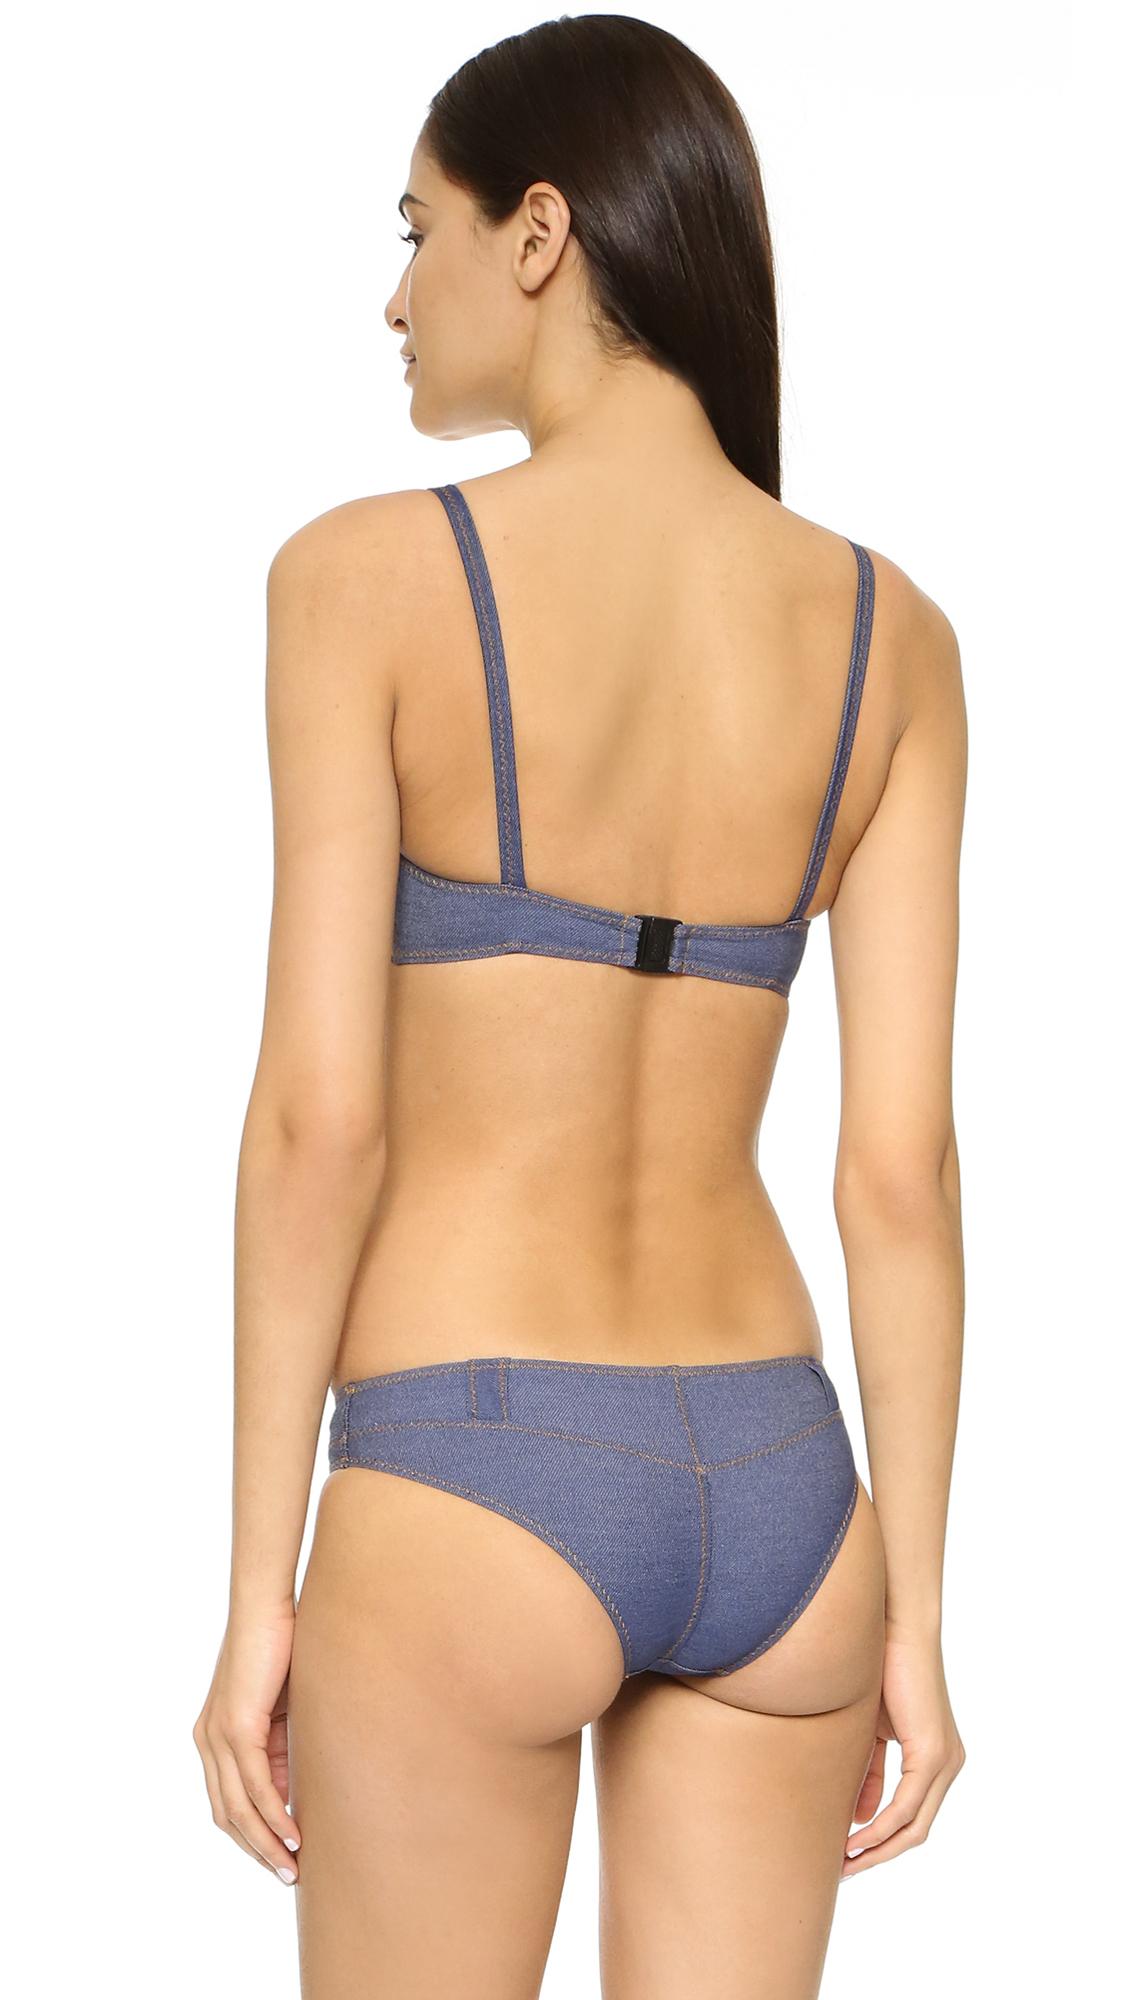 928c7b23265e3 Lisa Marie Fernandez Genevieve Denim Belt Loop Bikini in Blue - Lyst